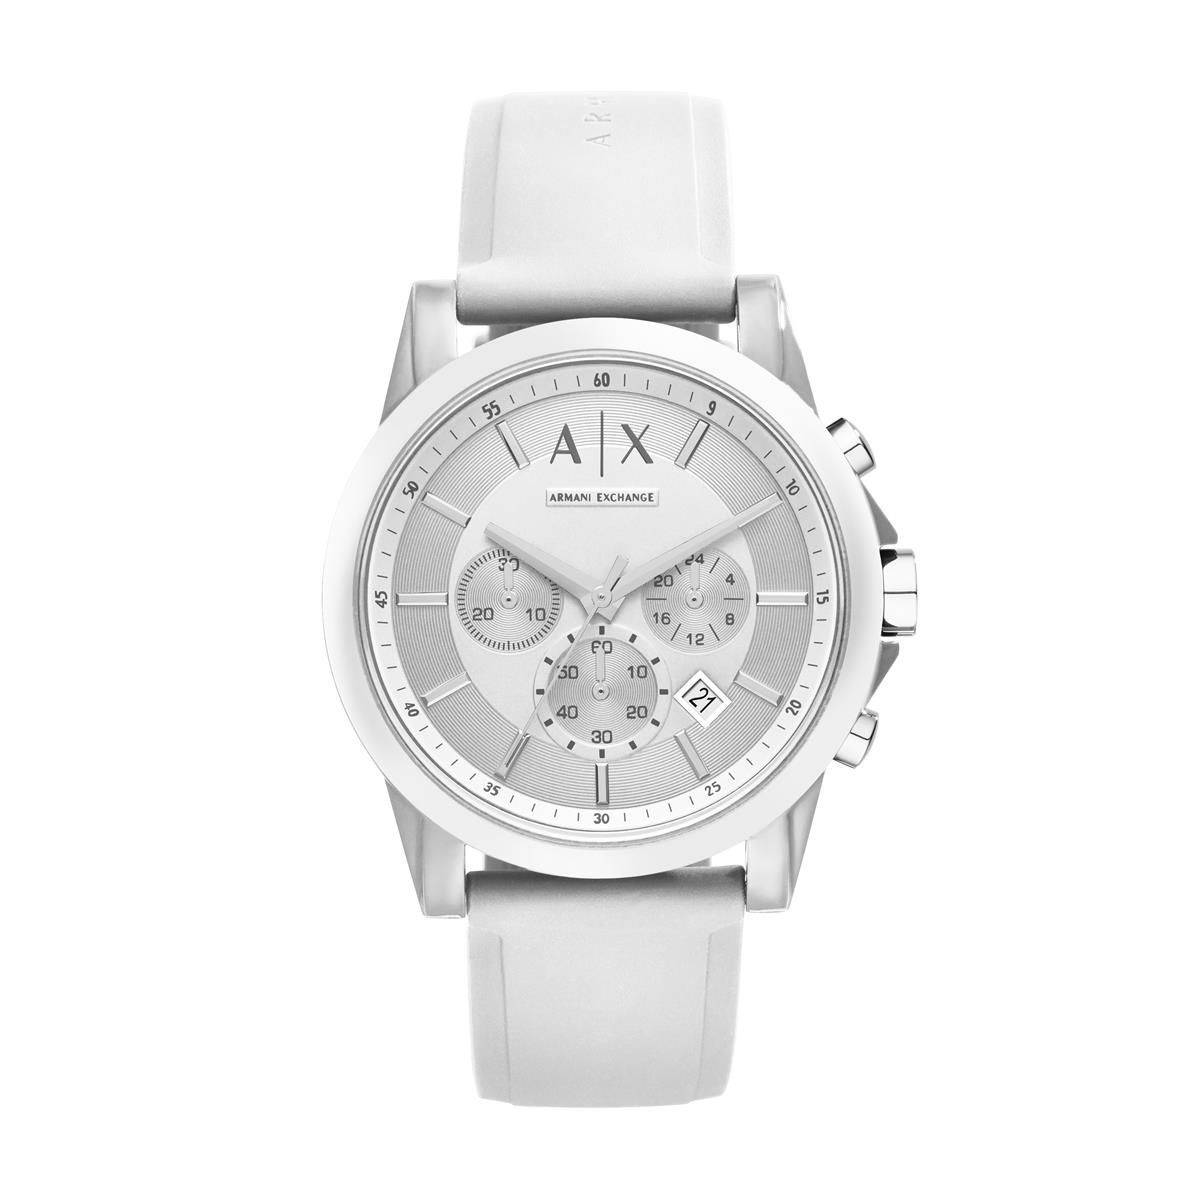 68dd1496807 Reloj Armani Exchange AX1325 Outerbanks Hombre